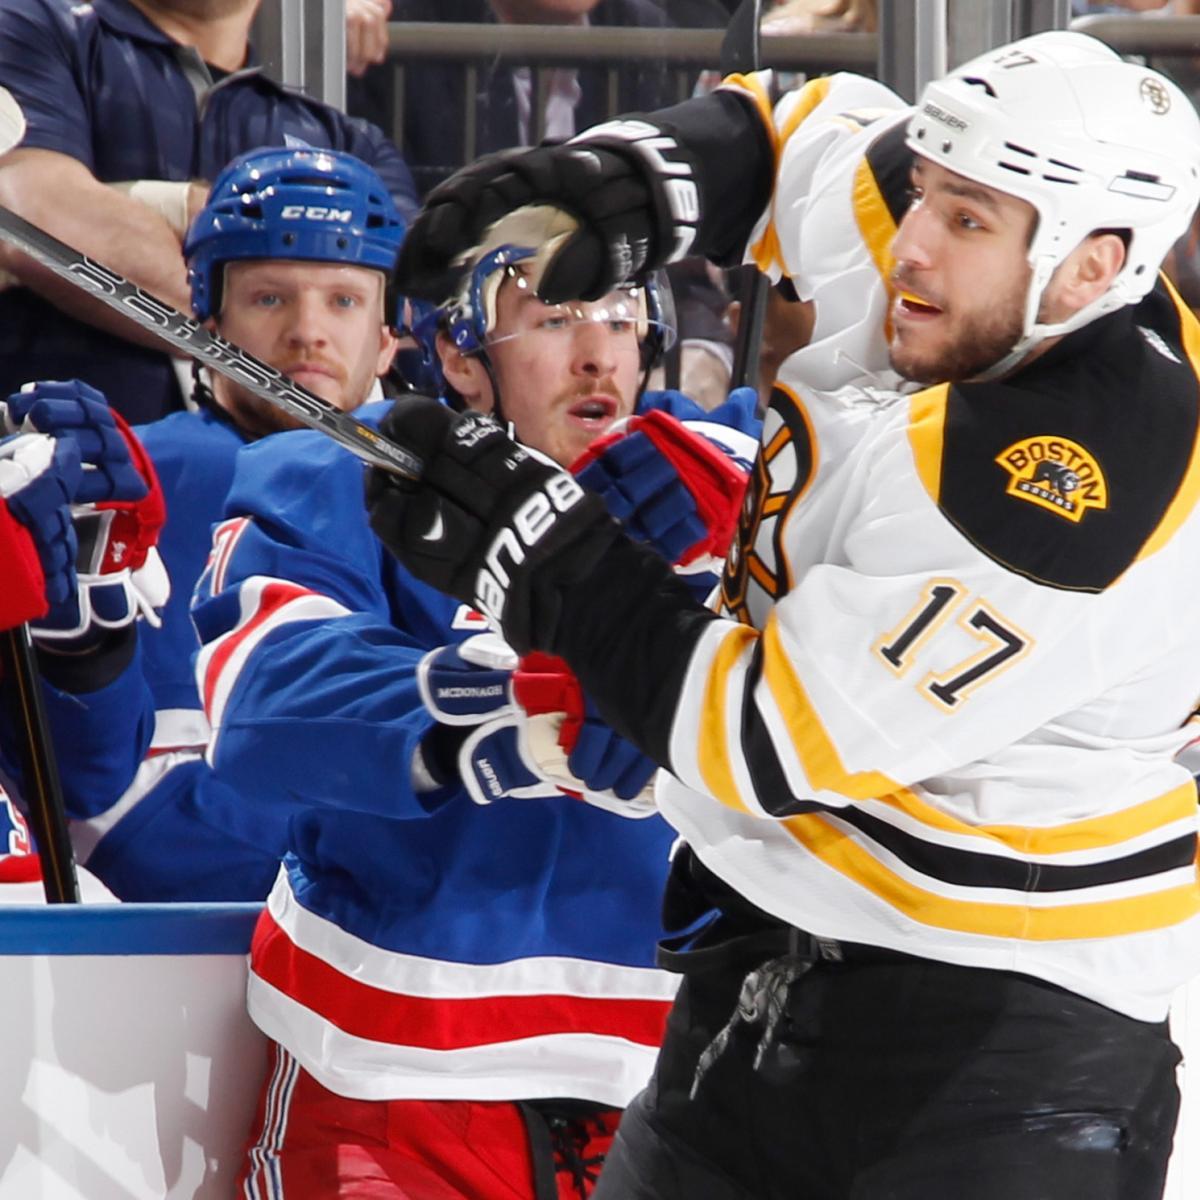 Preview, Prediction For Boston Bruins Season Series Opener